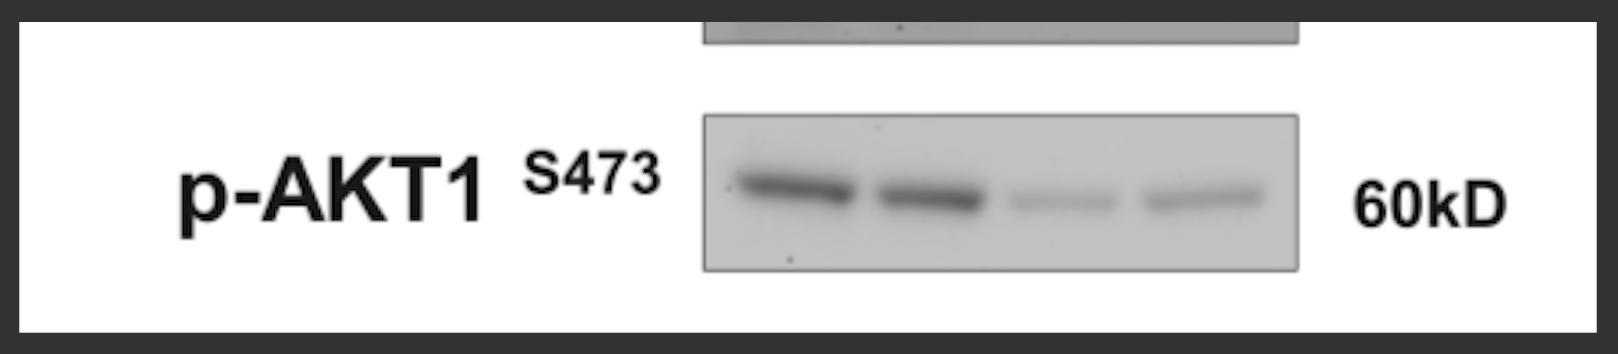 Great Antibody to Detect mTORC2 Activity Via pAKT